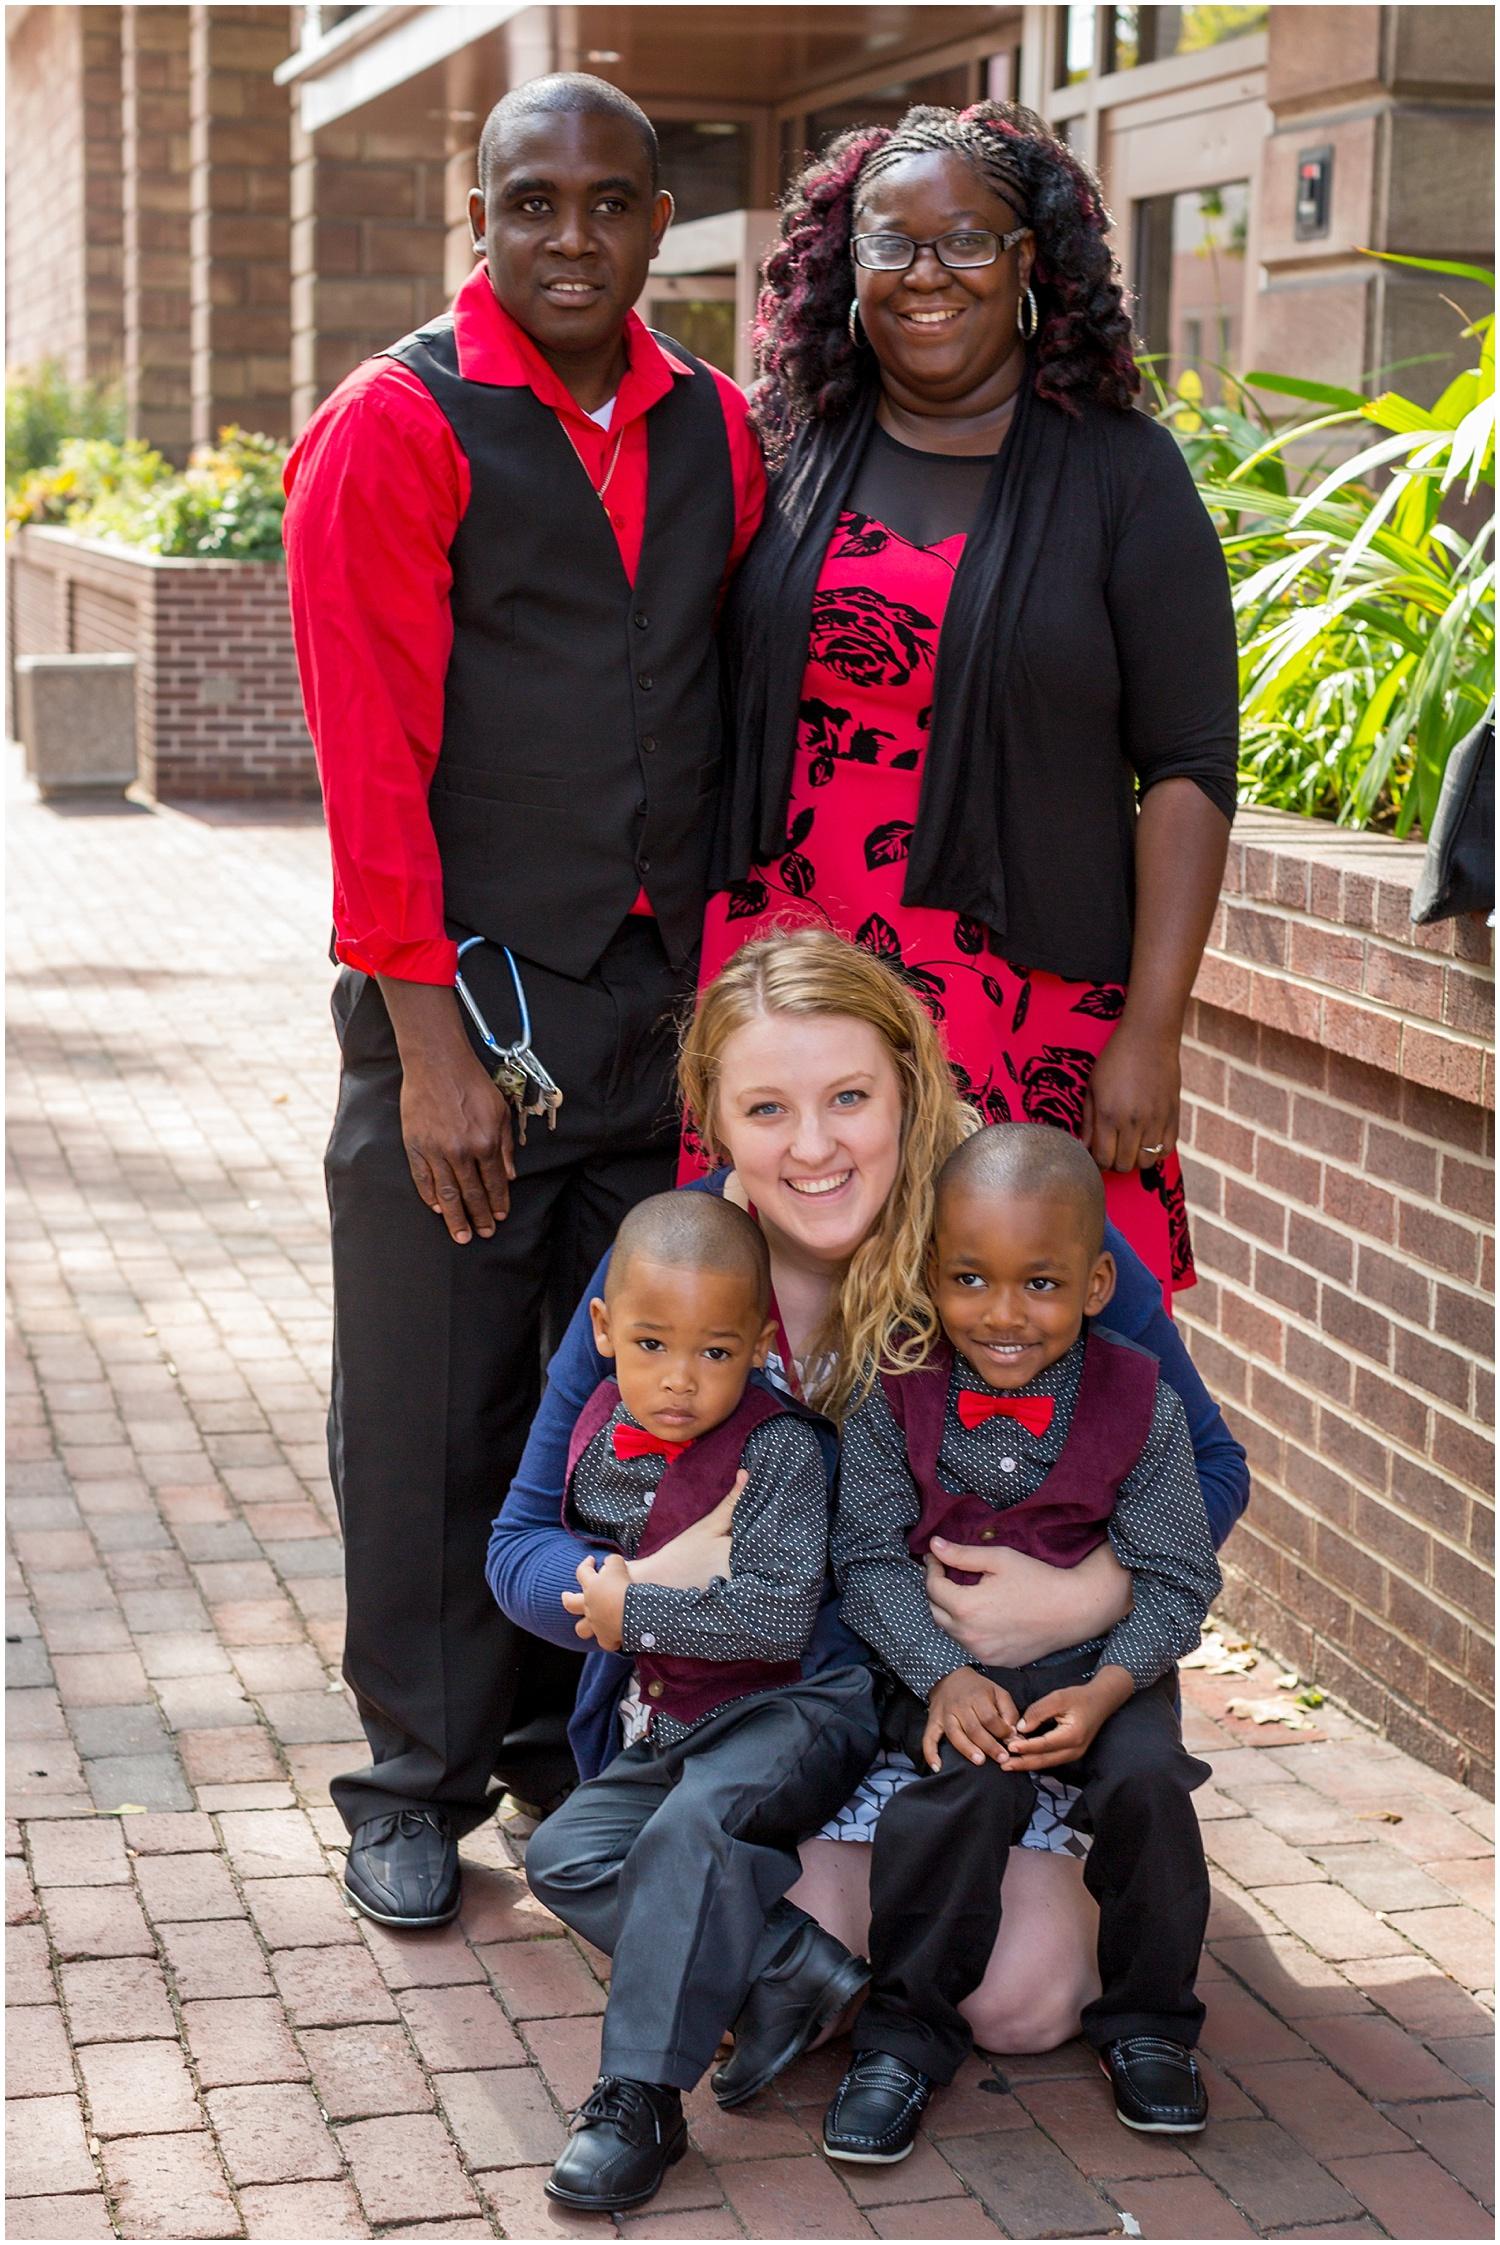 Berks County Adoption Family Photoshoot